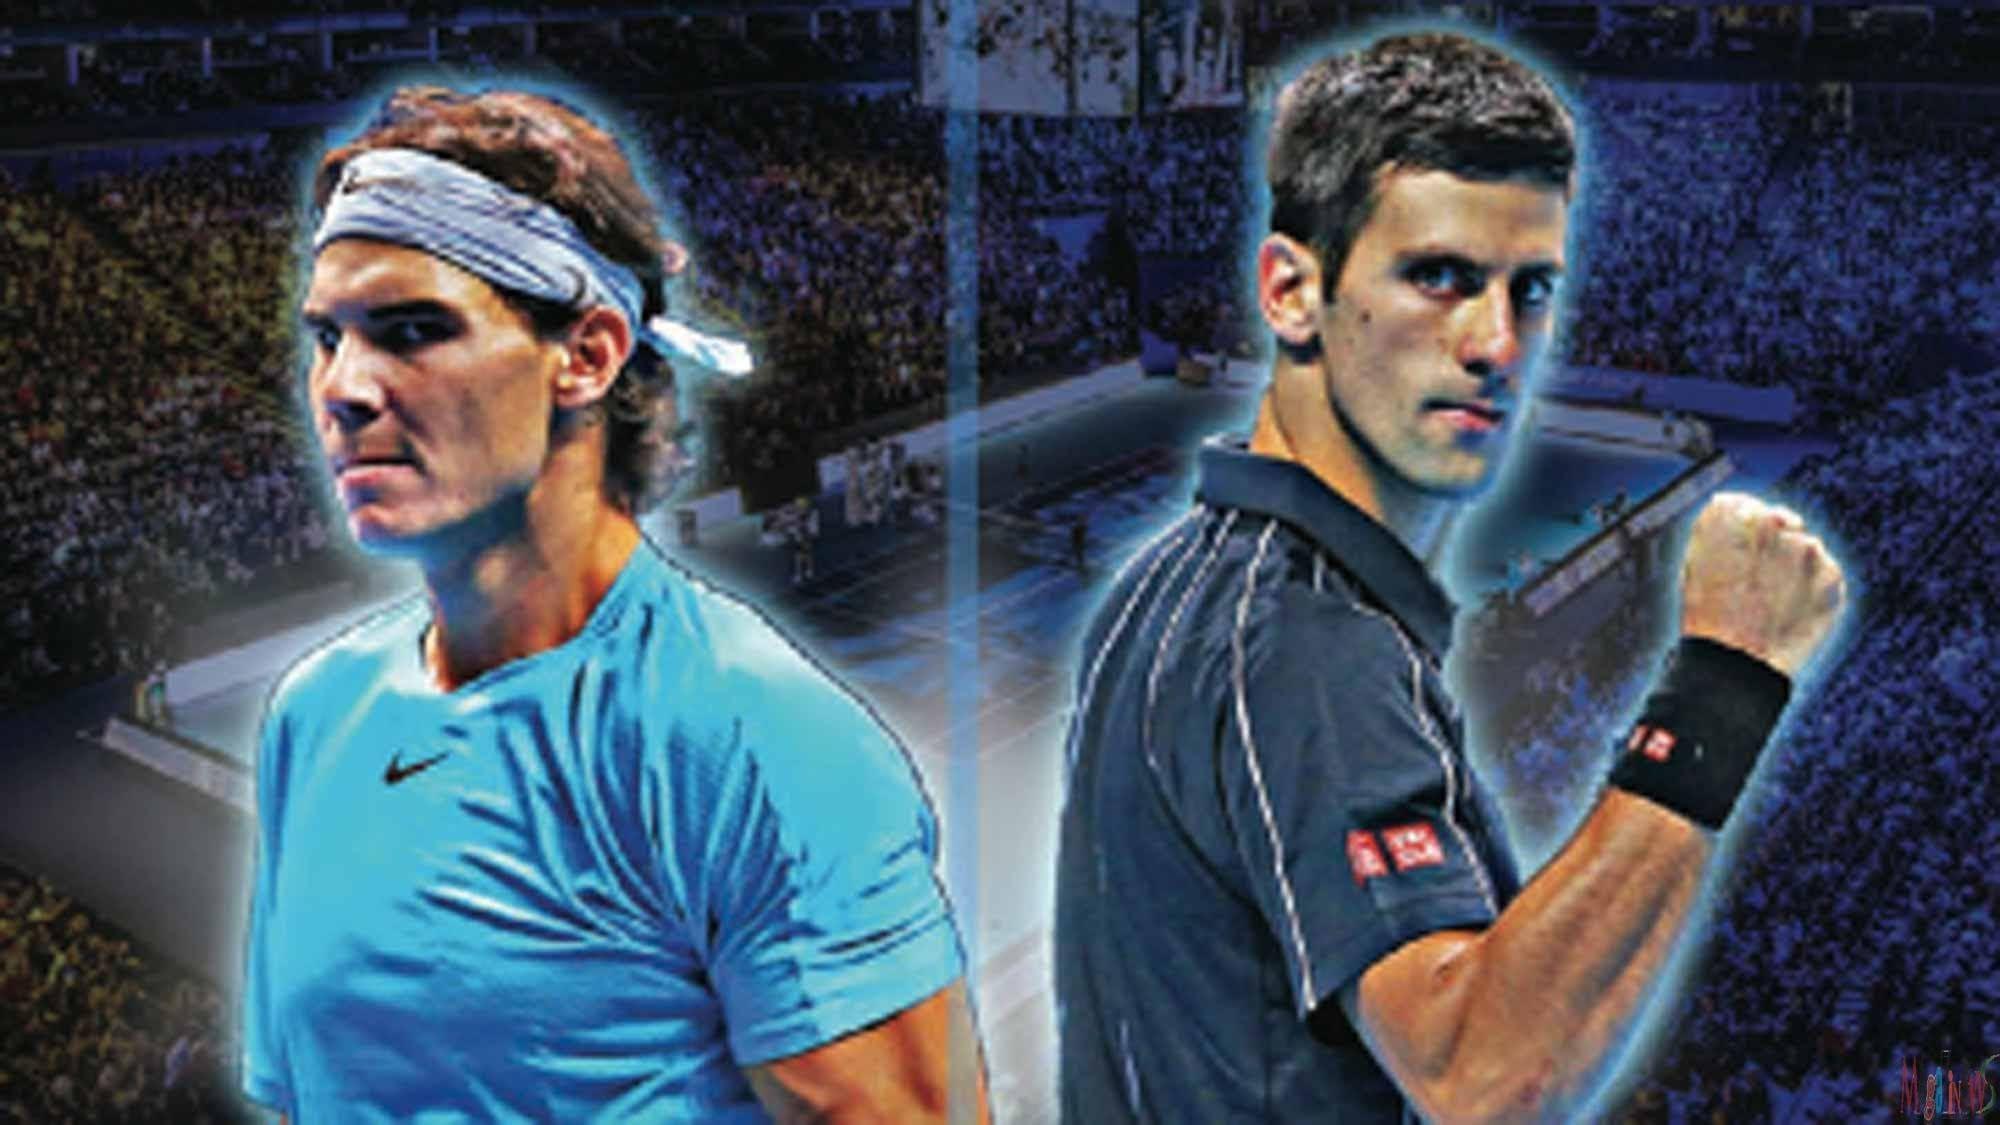 Nadal Vs Djokovic The Endless Battle Hd Novak Djokovic Finals Rafael Nadal